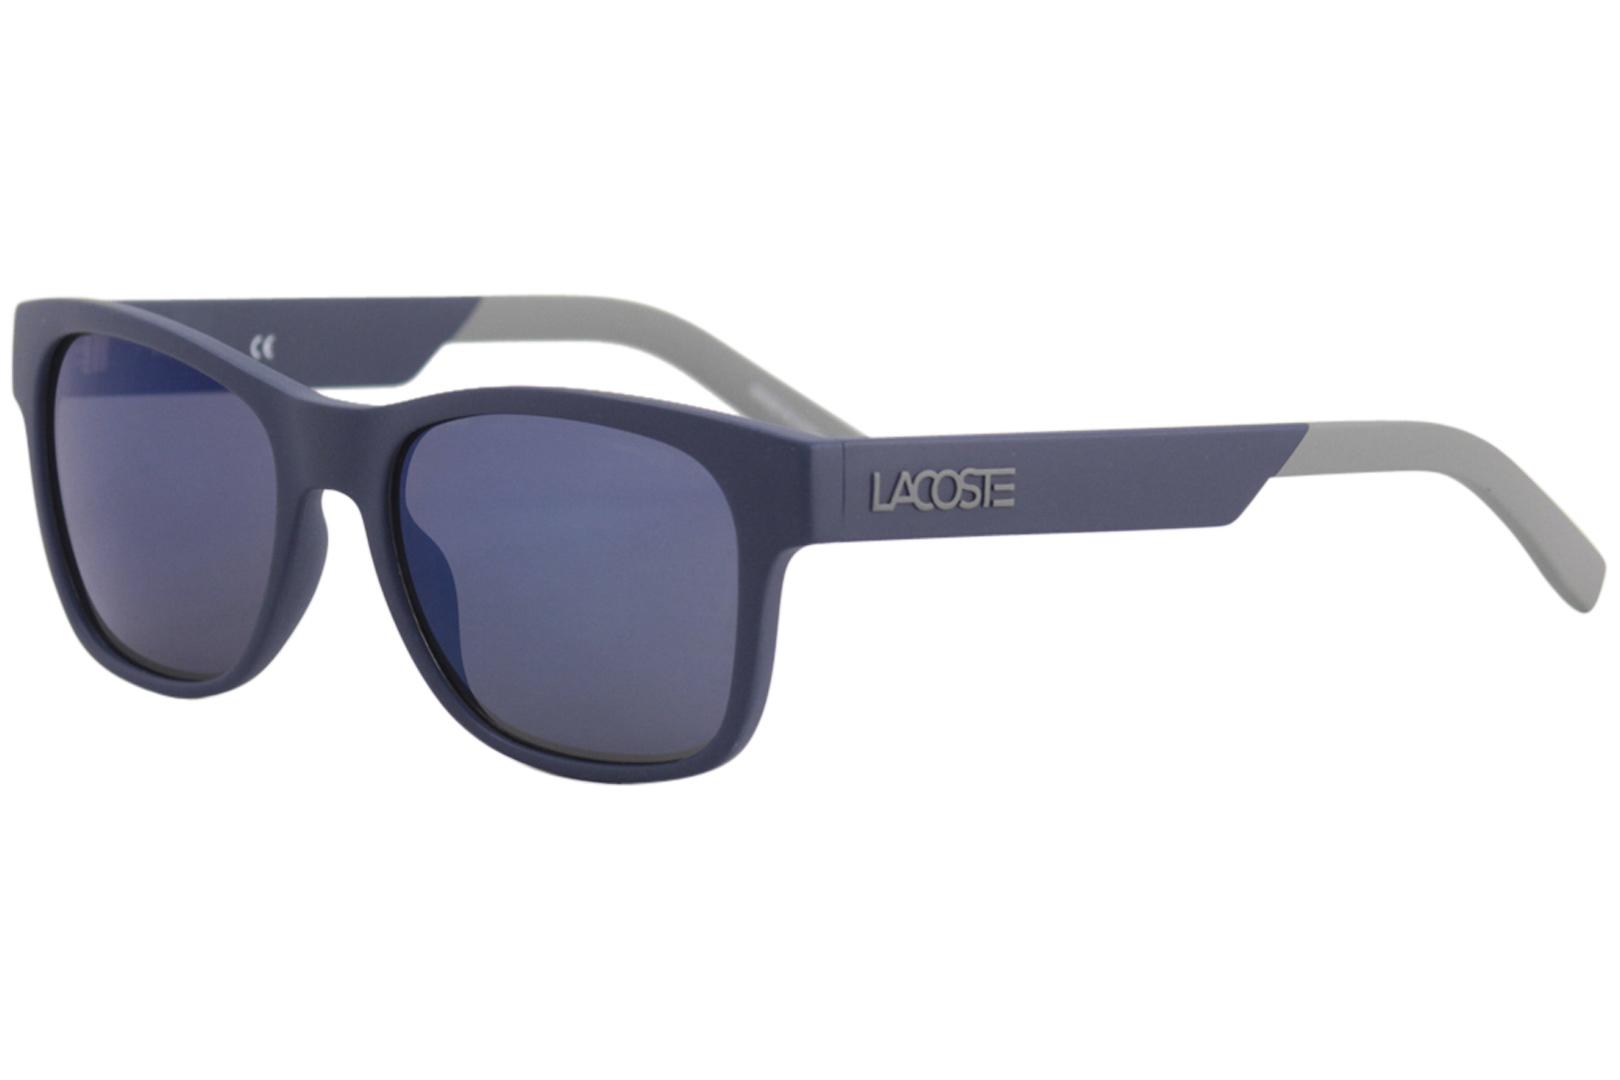 bc69a13234 Lacoste Men s L829S L 829 S 414 Matte Blue Fashion Square Sunglasses ...